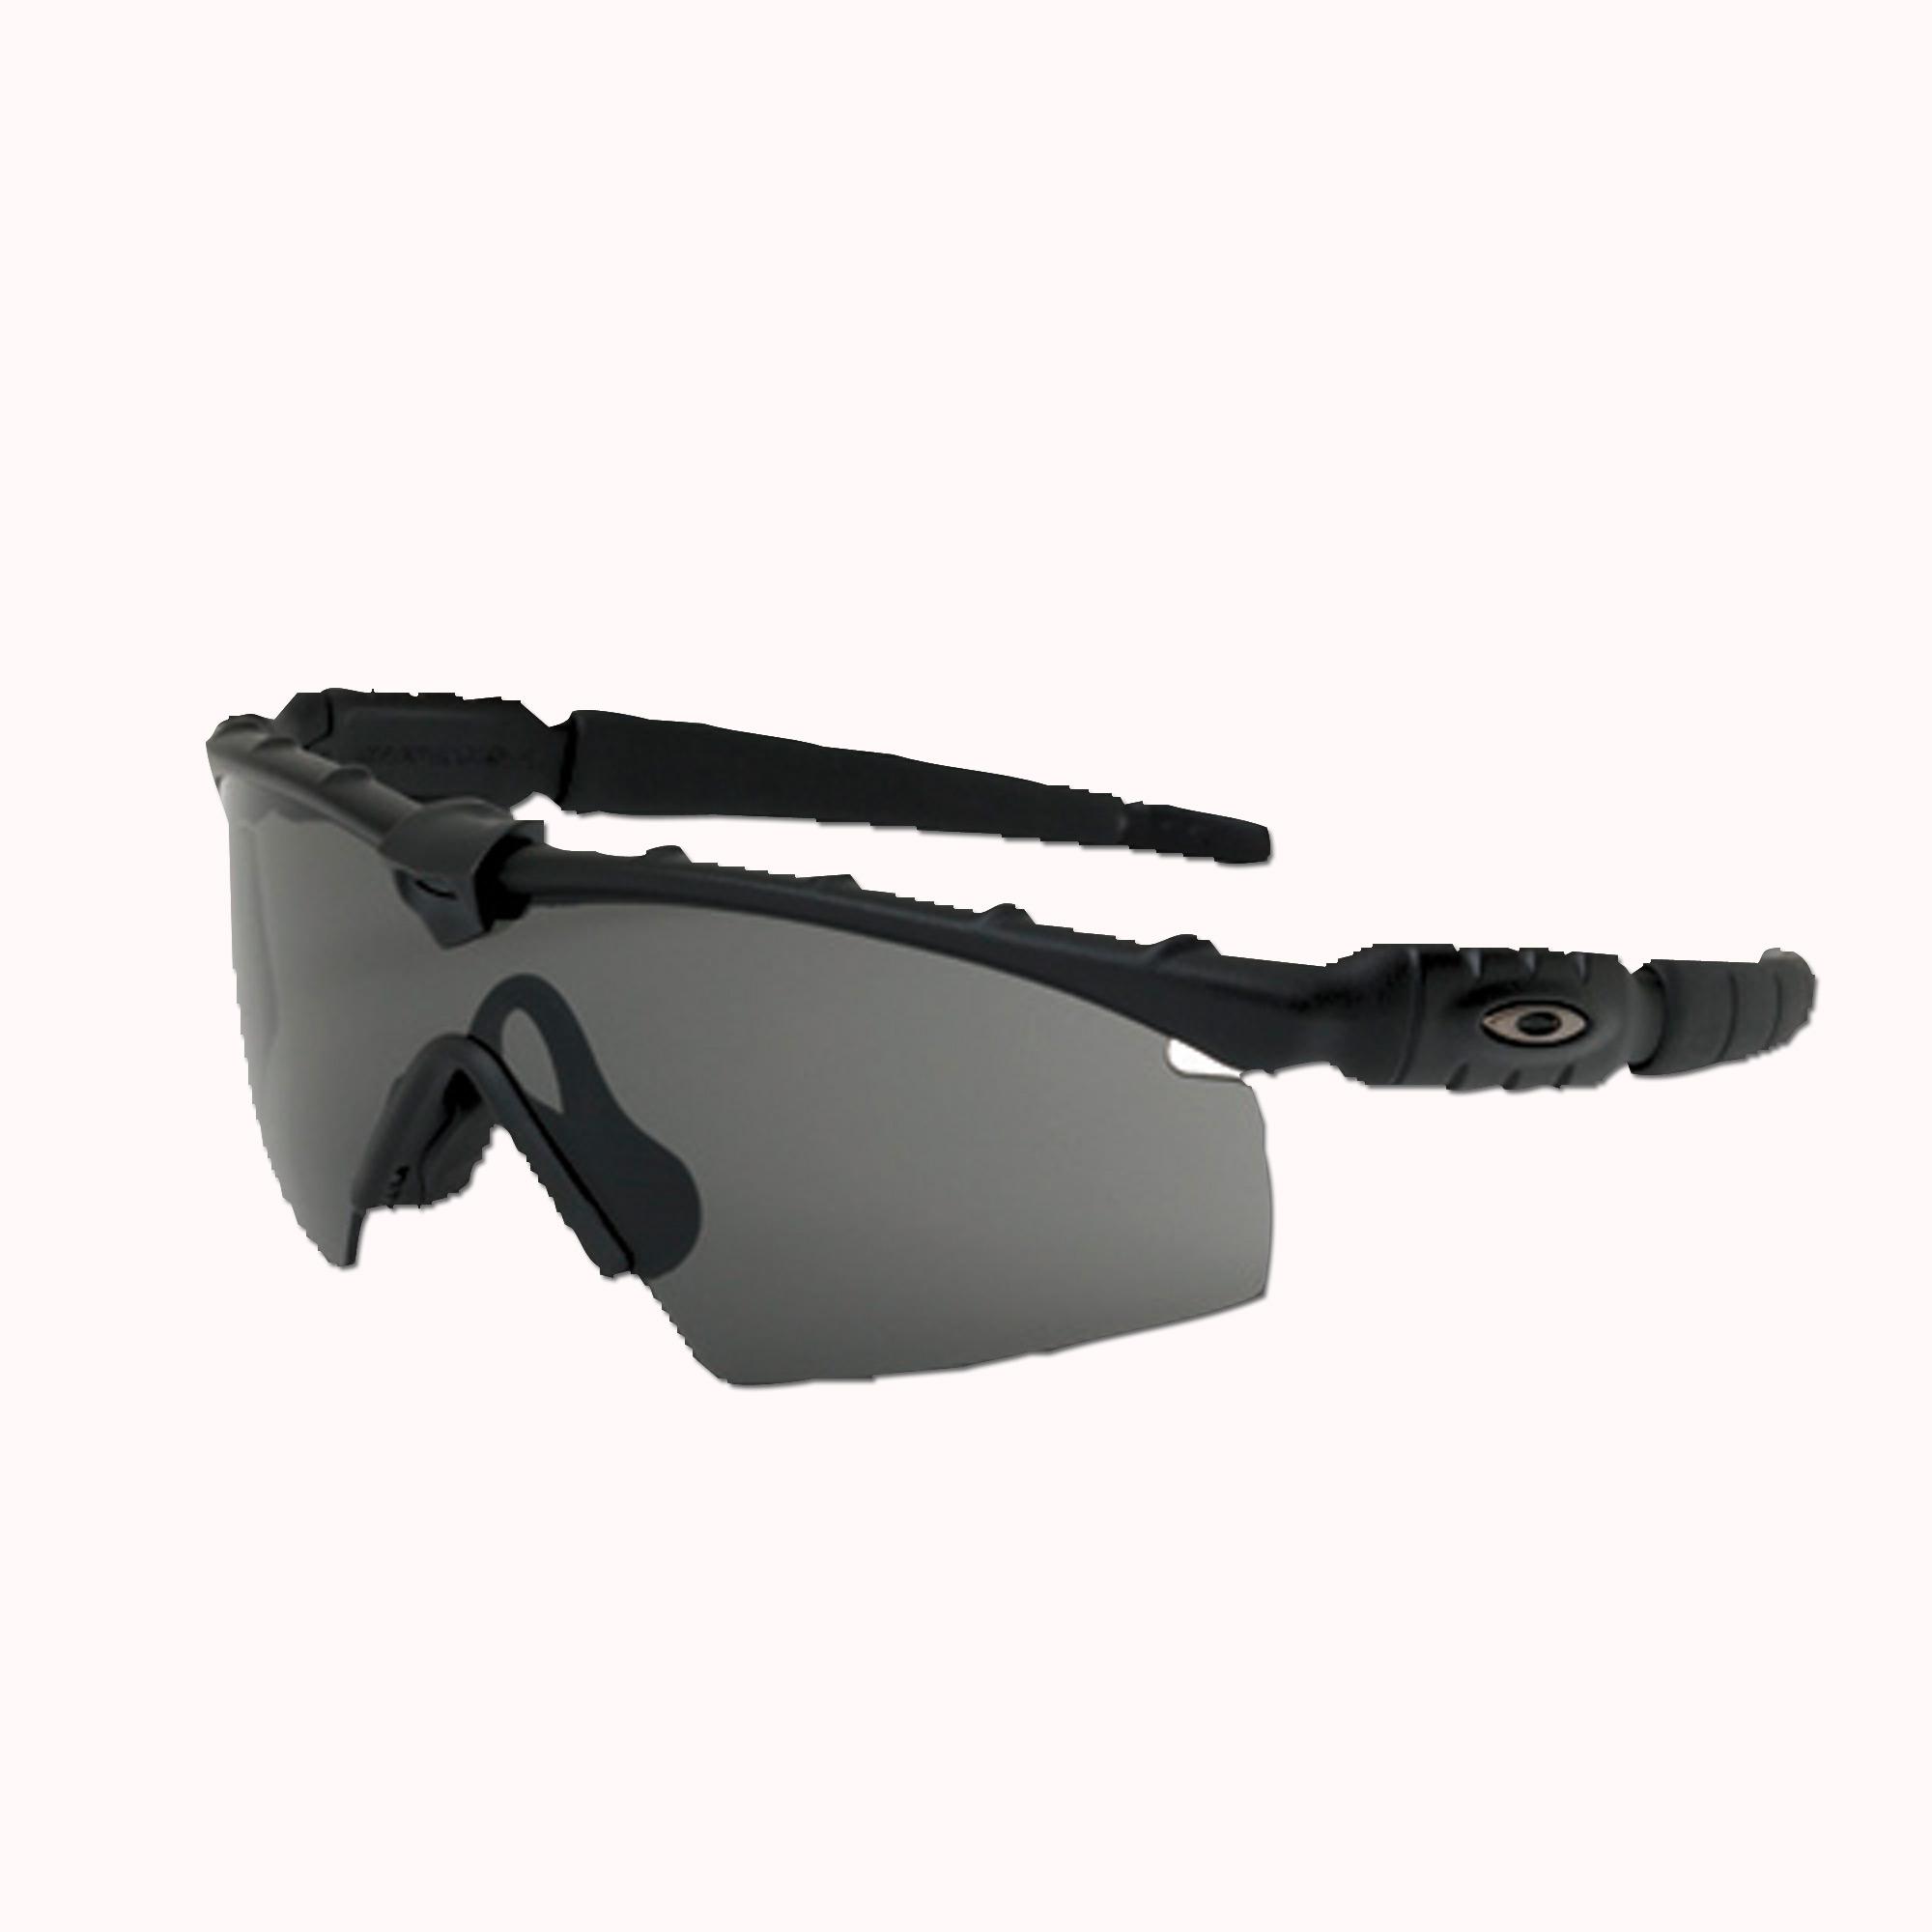 valle muto uva  Sunglasses Oakley M-Frame 2.0 Strike Array | Sunglasses Oakley M-Frame 2.0  Strike Array